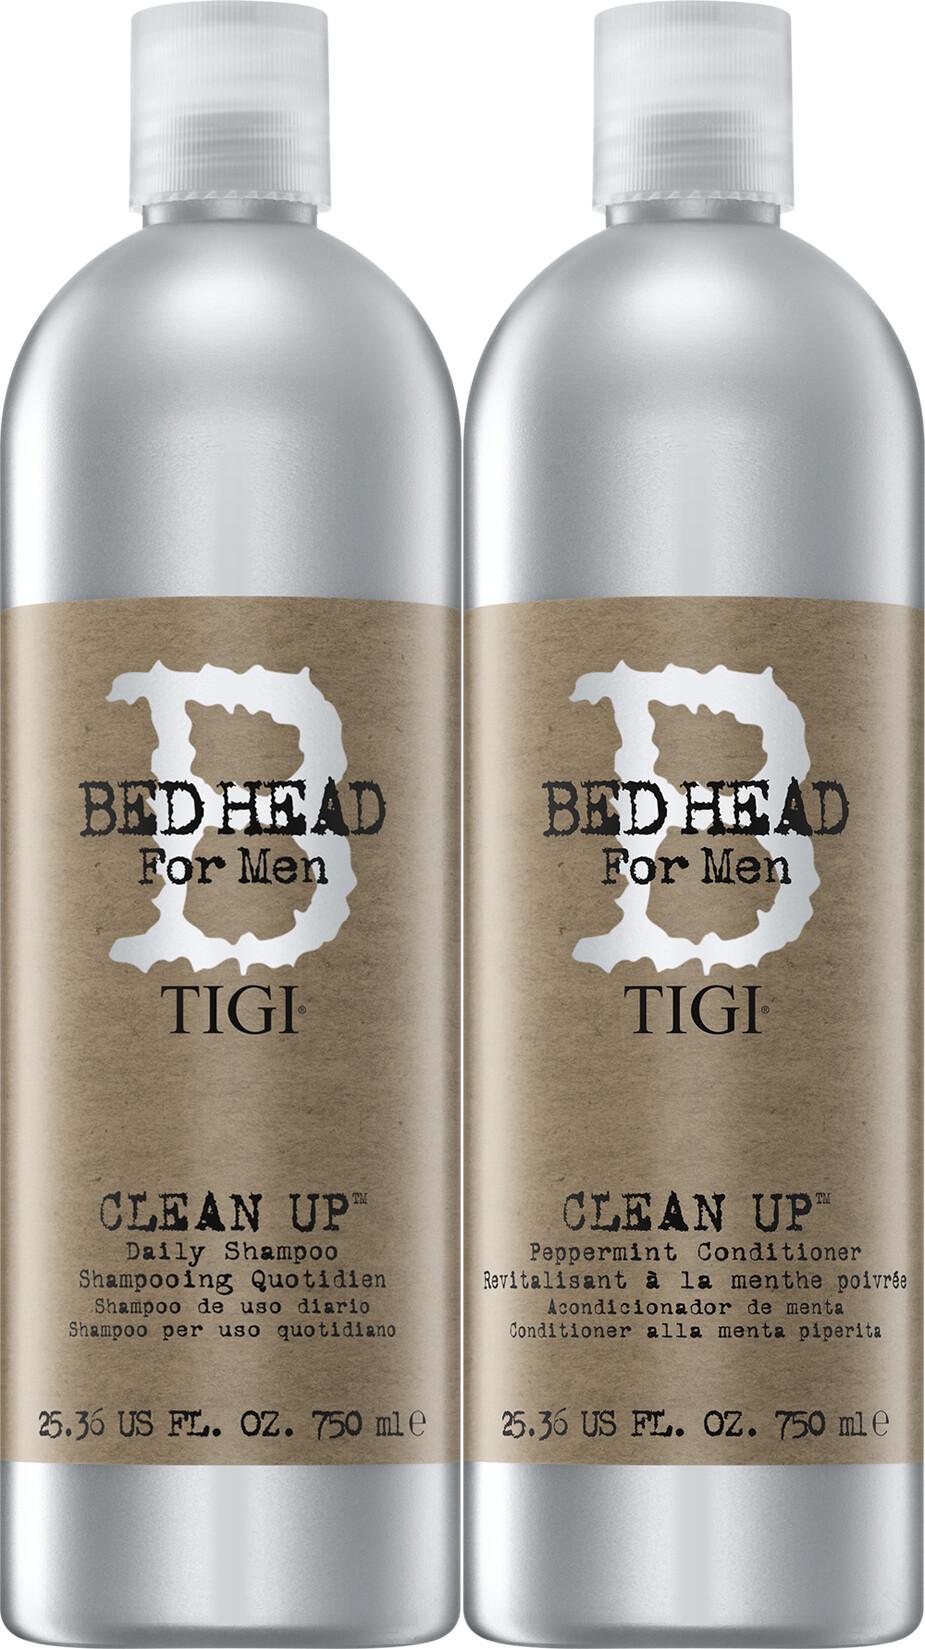 TIGI Bed Head For Men Clean Up Shampoo and Conditioner Tween Duo 2 x 750ml